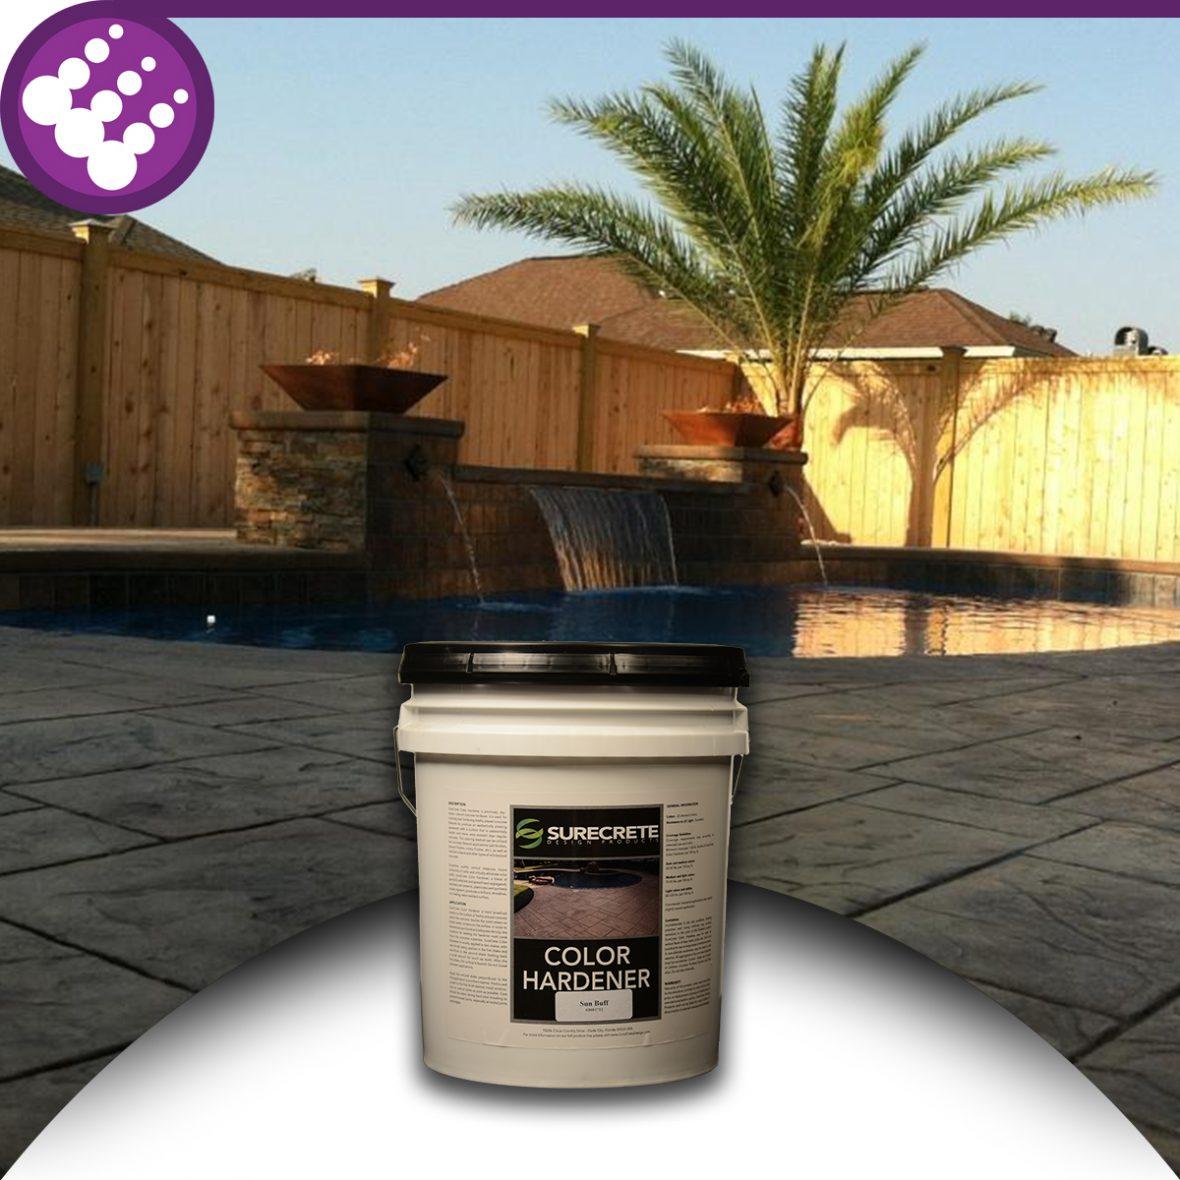 Surecrete Freshly Poured Concrete Color Hardener